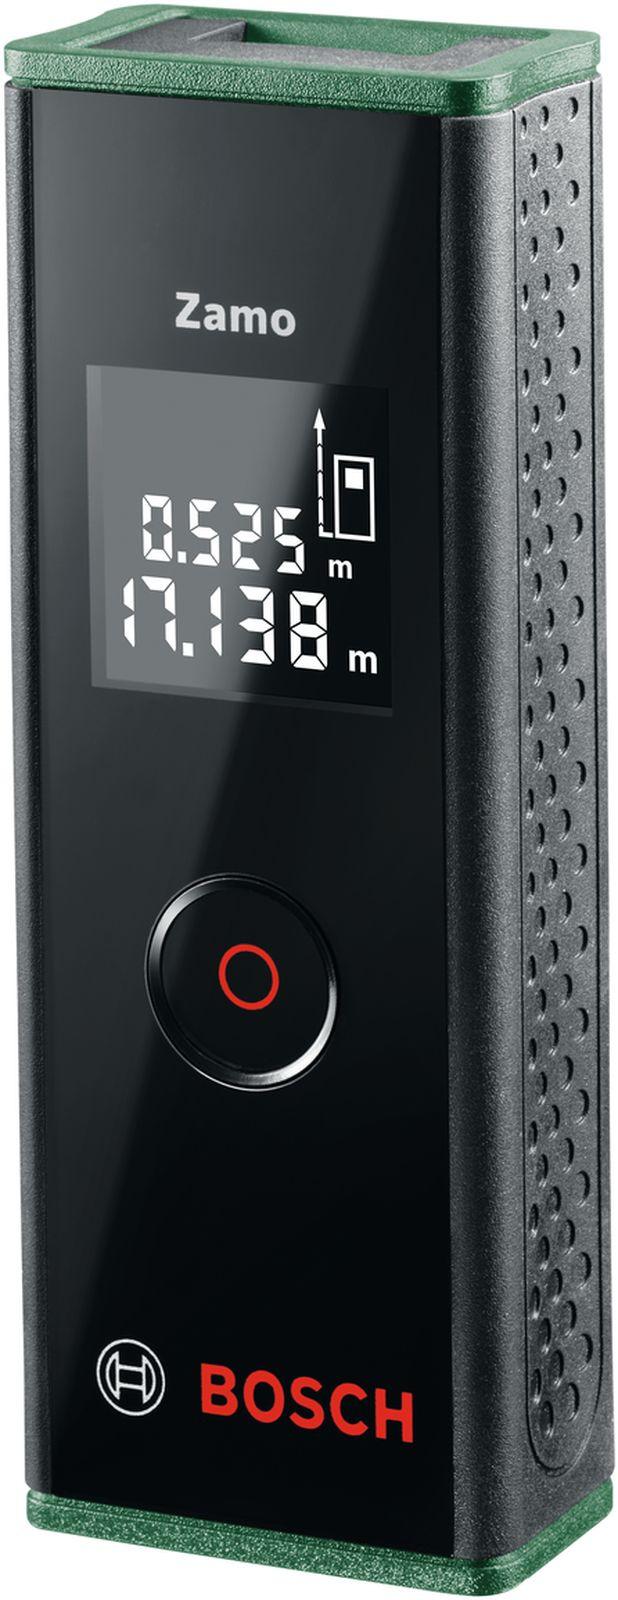 Дальномер Bosch Easy Zamo III Basic, 0603672700 лазерный дальномер bosch zamo 0603672421